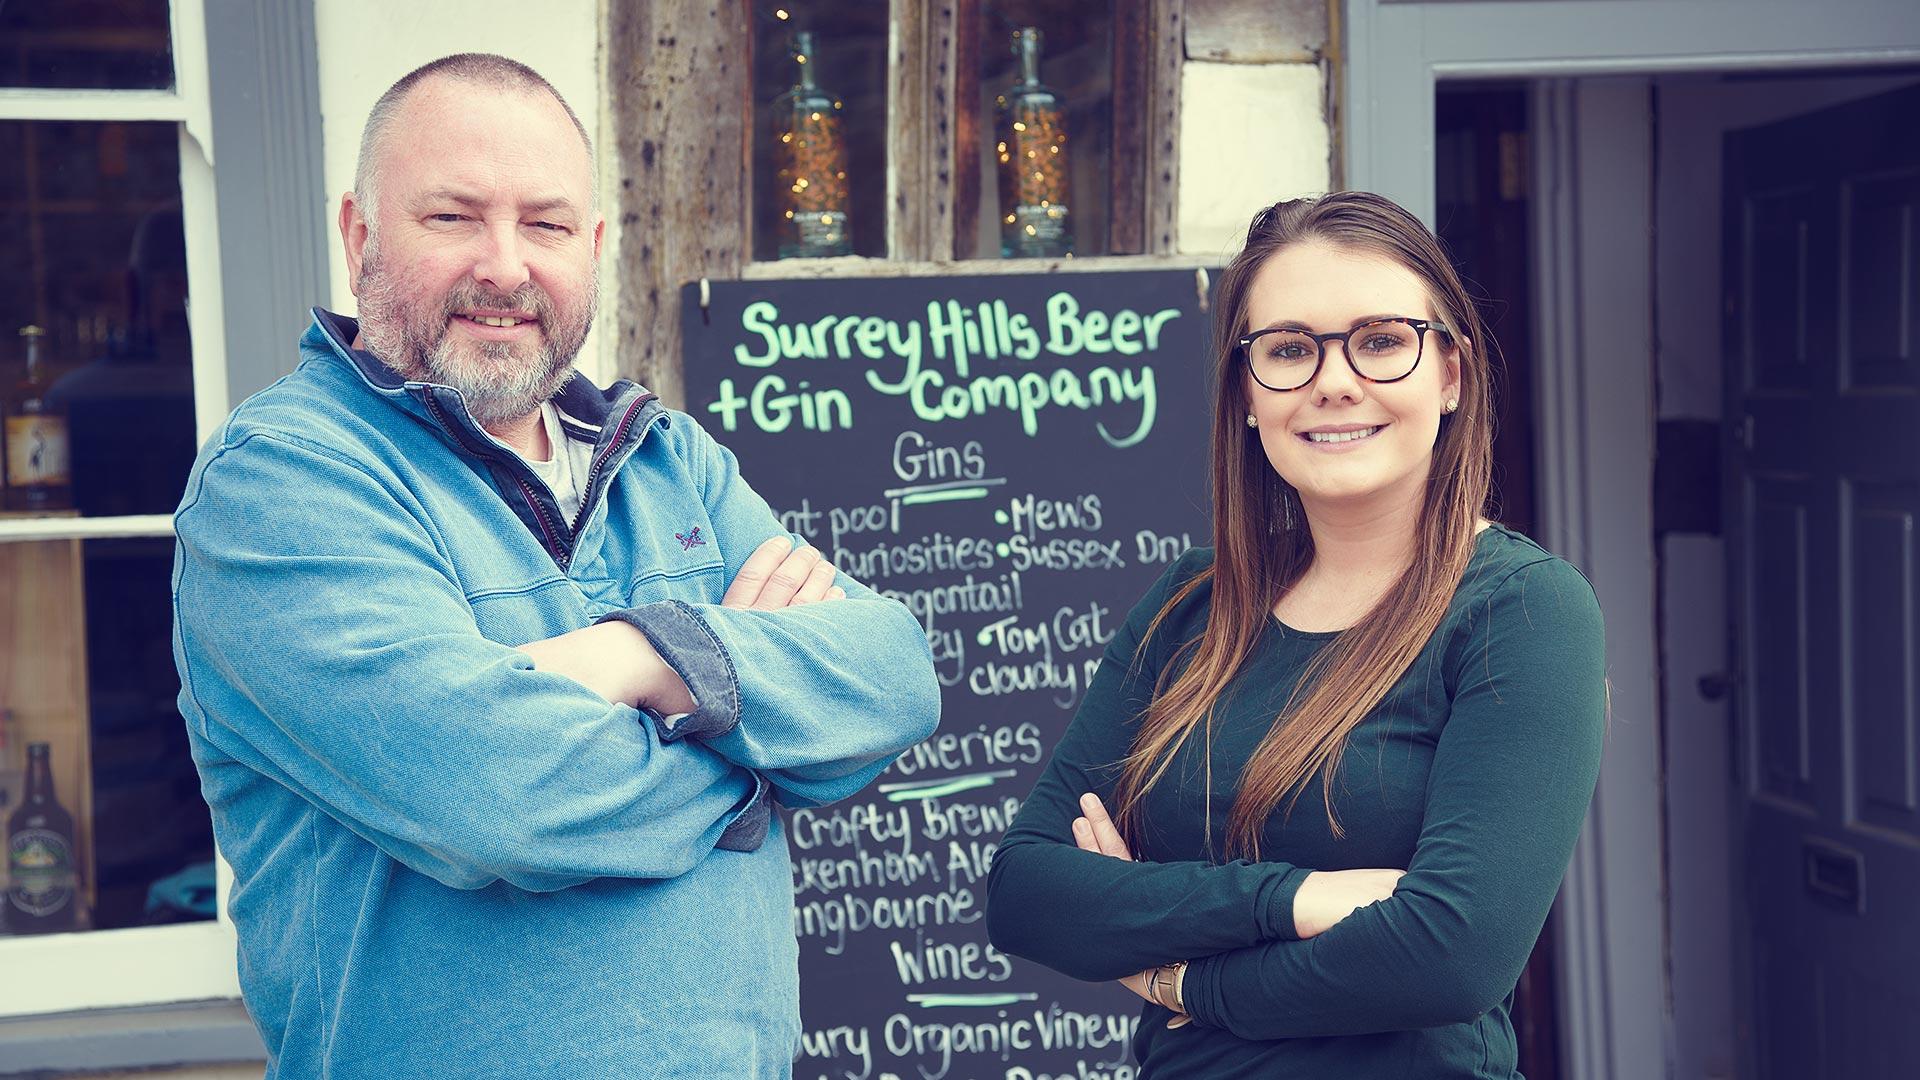 surrey-hills-beer-&-gin-company-steve-&-sophie